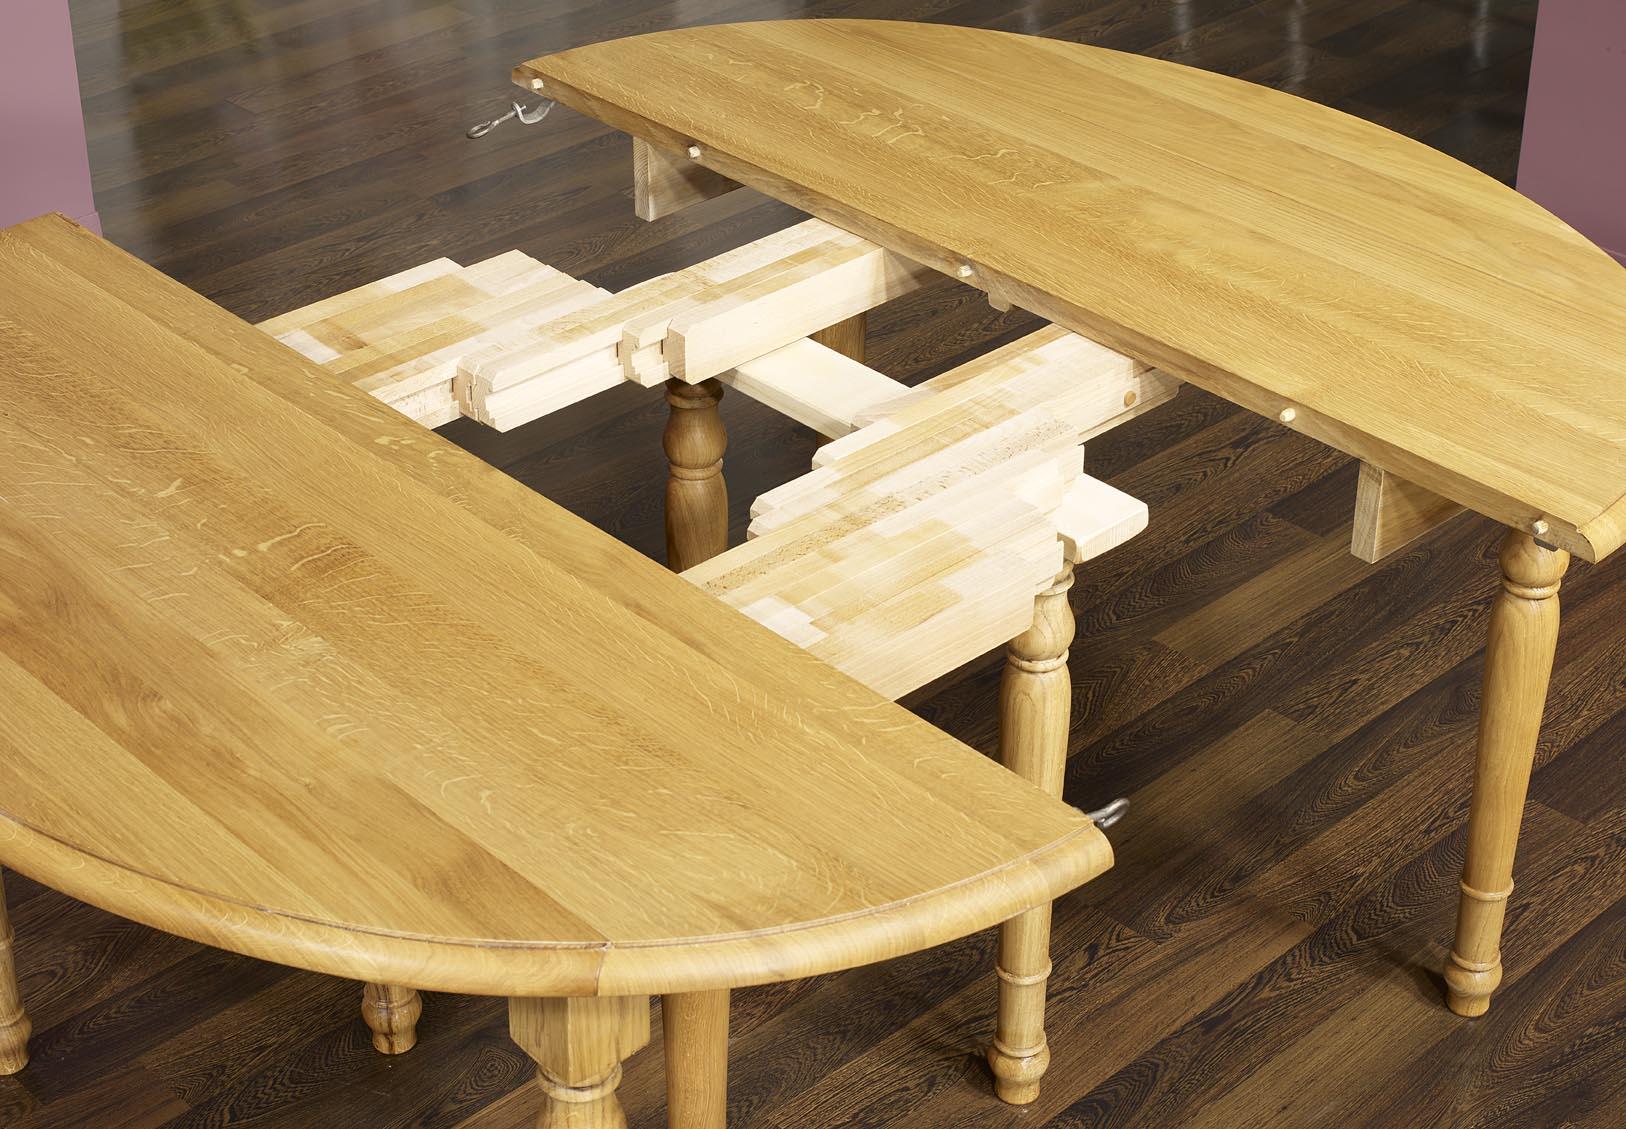 Table ovale volets 135x110 en ch ne massif de style for Table ronde bois massif avec rallonge